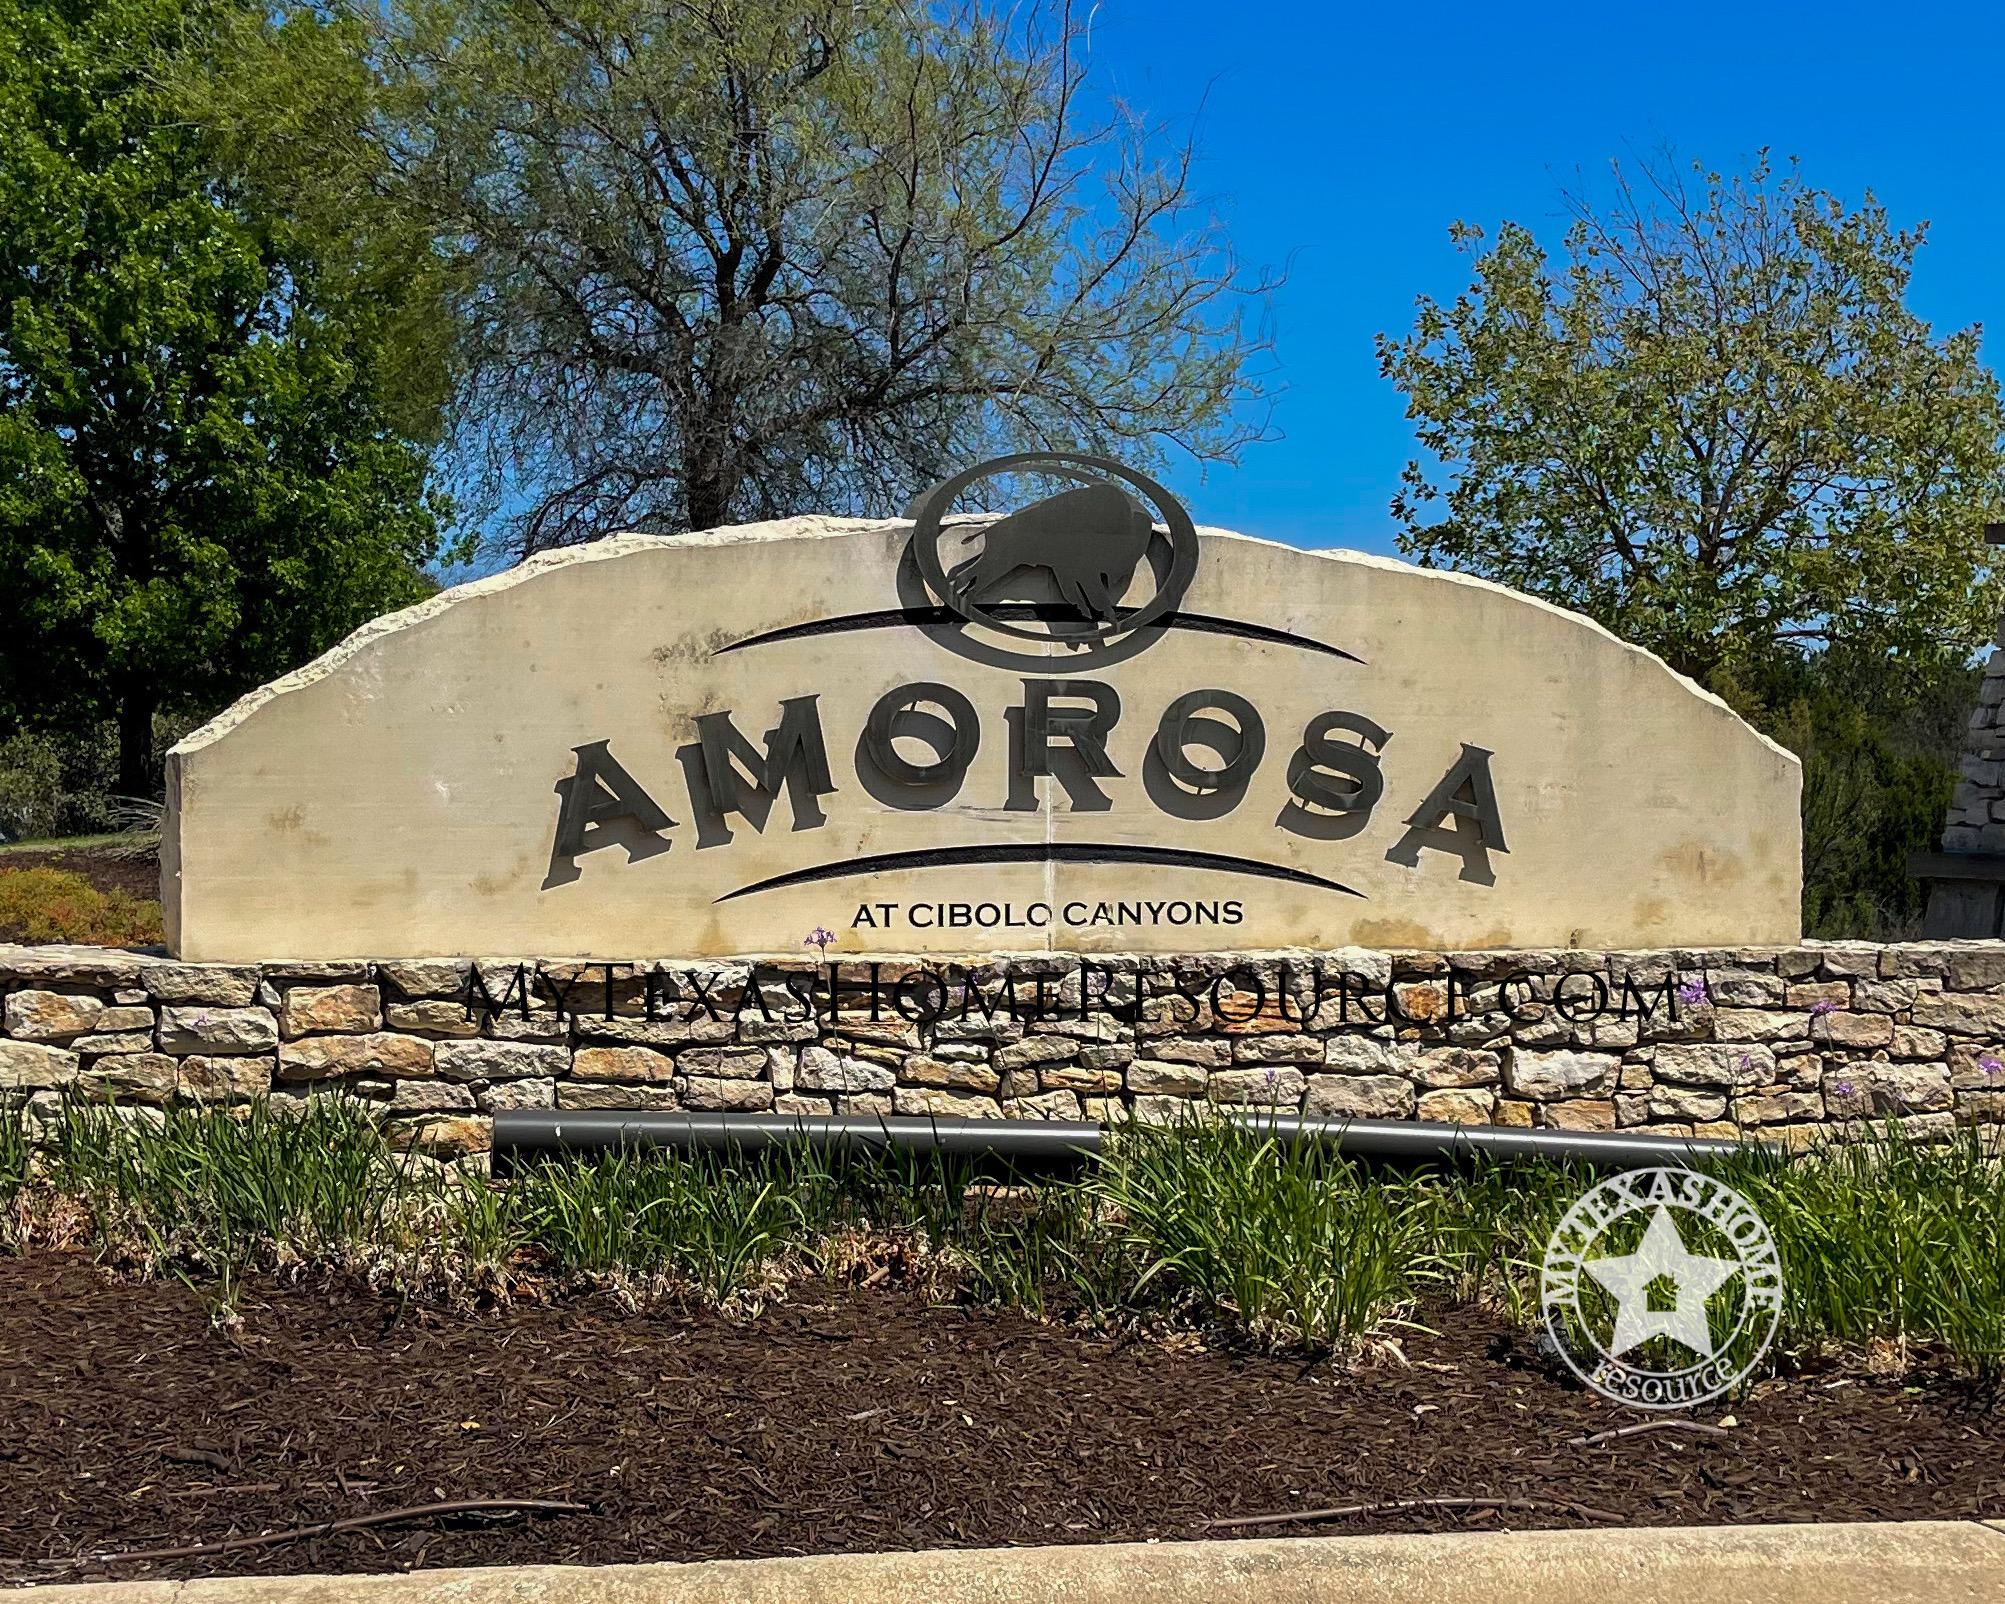 Amorsa At Cibolo Canyons Community In San Antonio, TX